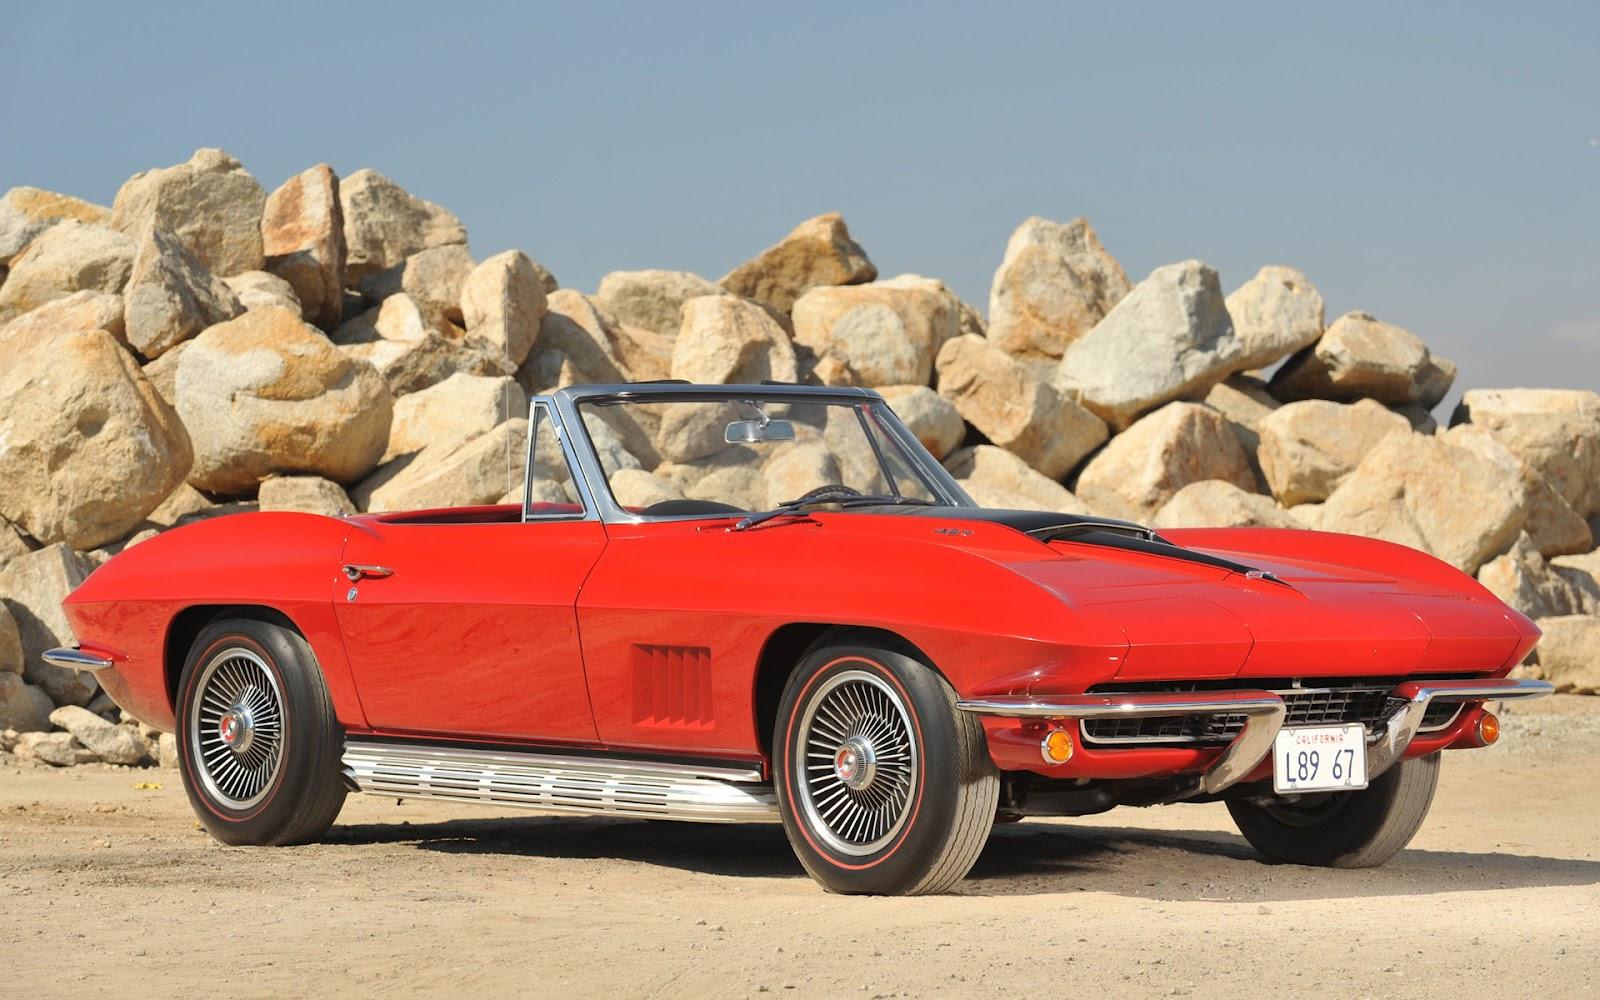 http://2.bp.blogspot.com/-nPH6iCBvukw/T8OAEv6tSMI/AAAAAAAAwqg/PIHTuC0VsjA/s1600/Corvette+427+L89+Convertible+1967.jpg